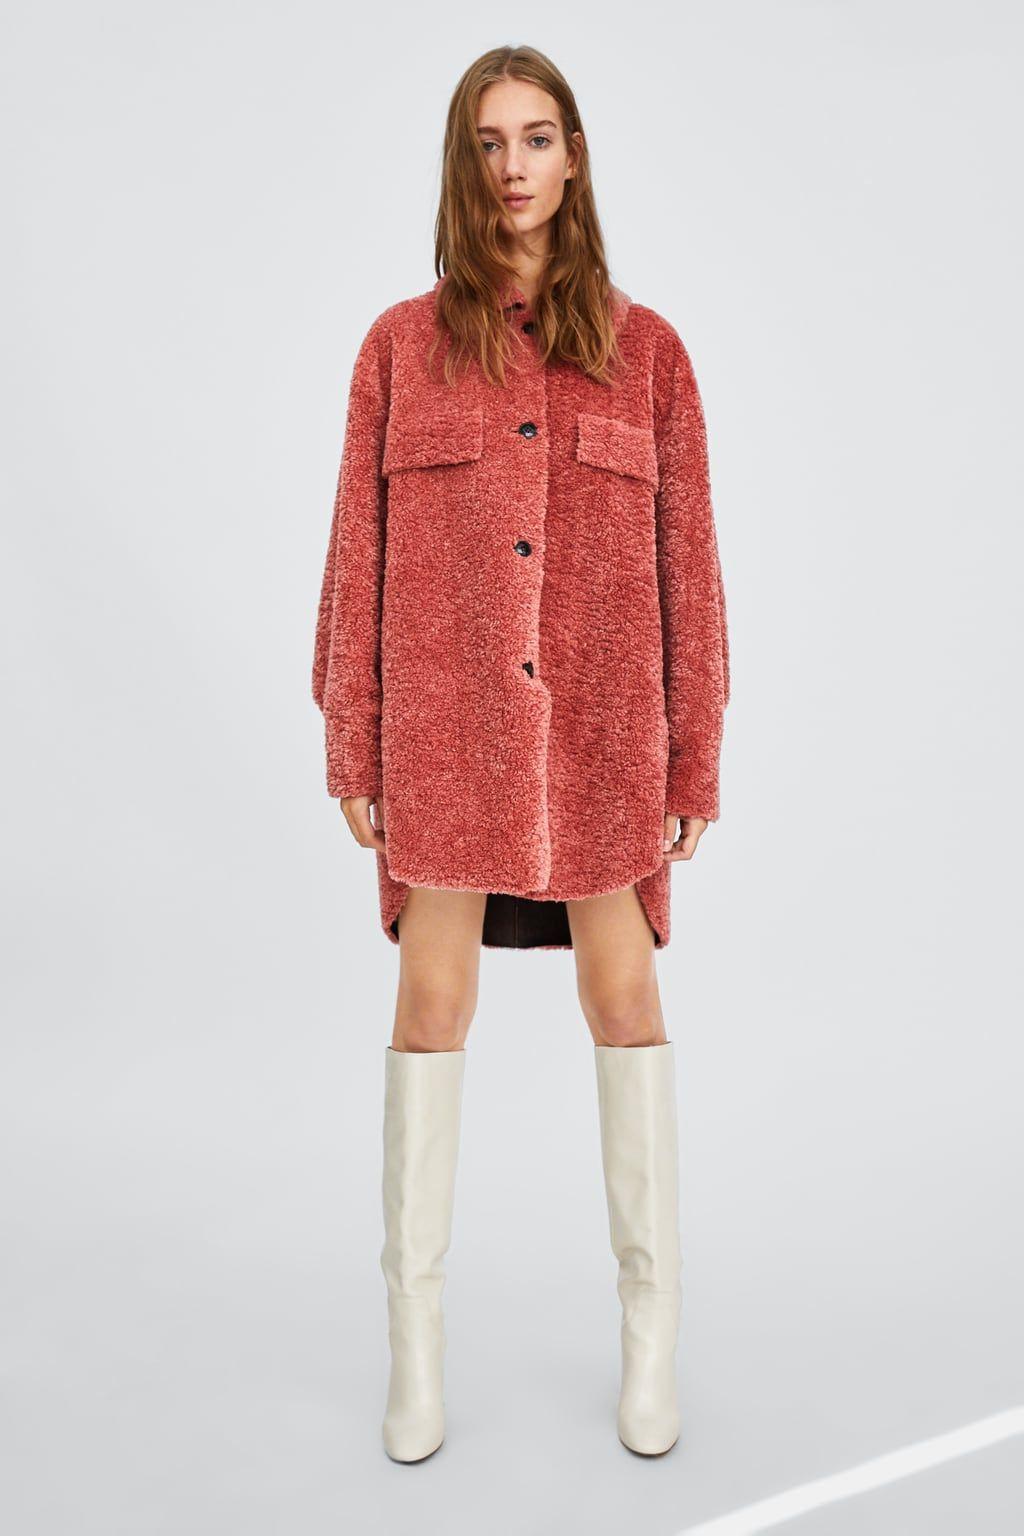 gran venta da1d3 453eb SOBRECAMISA BORREGUILLO   Clothes❤️ in 2019   Fall outfits ...